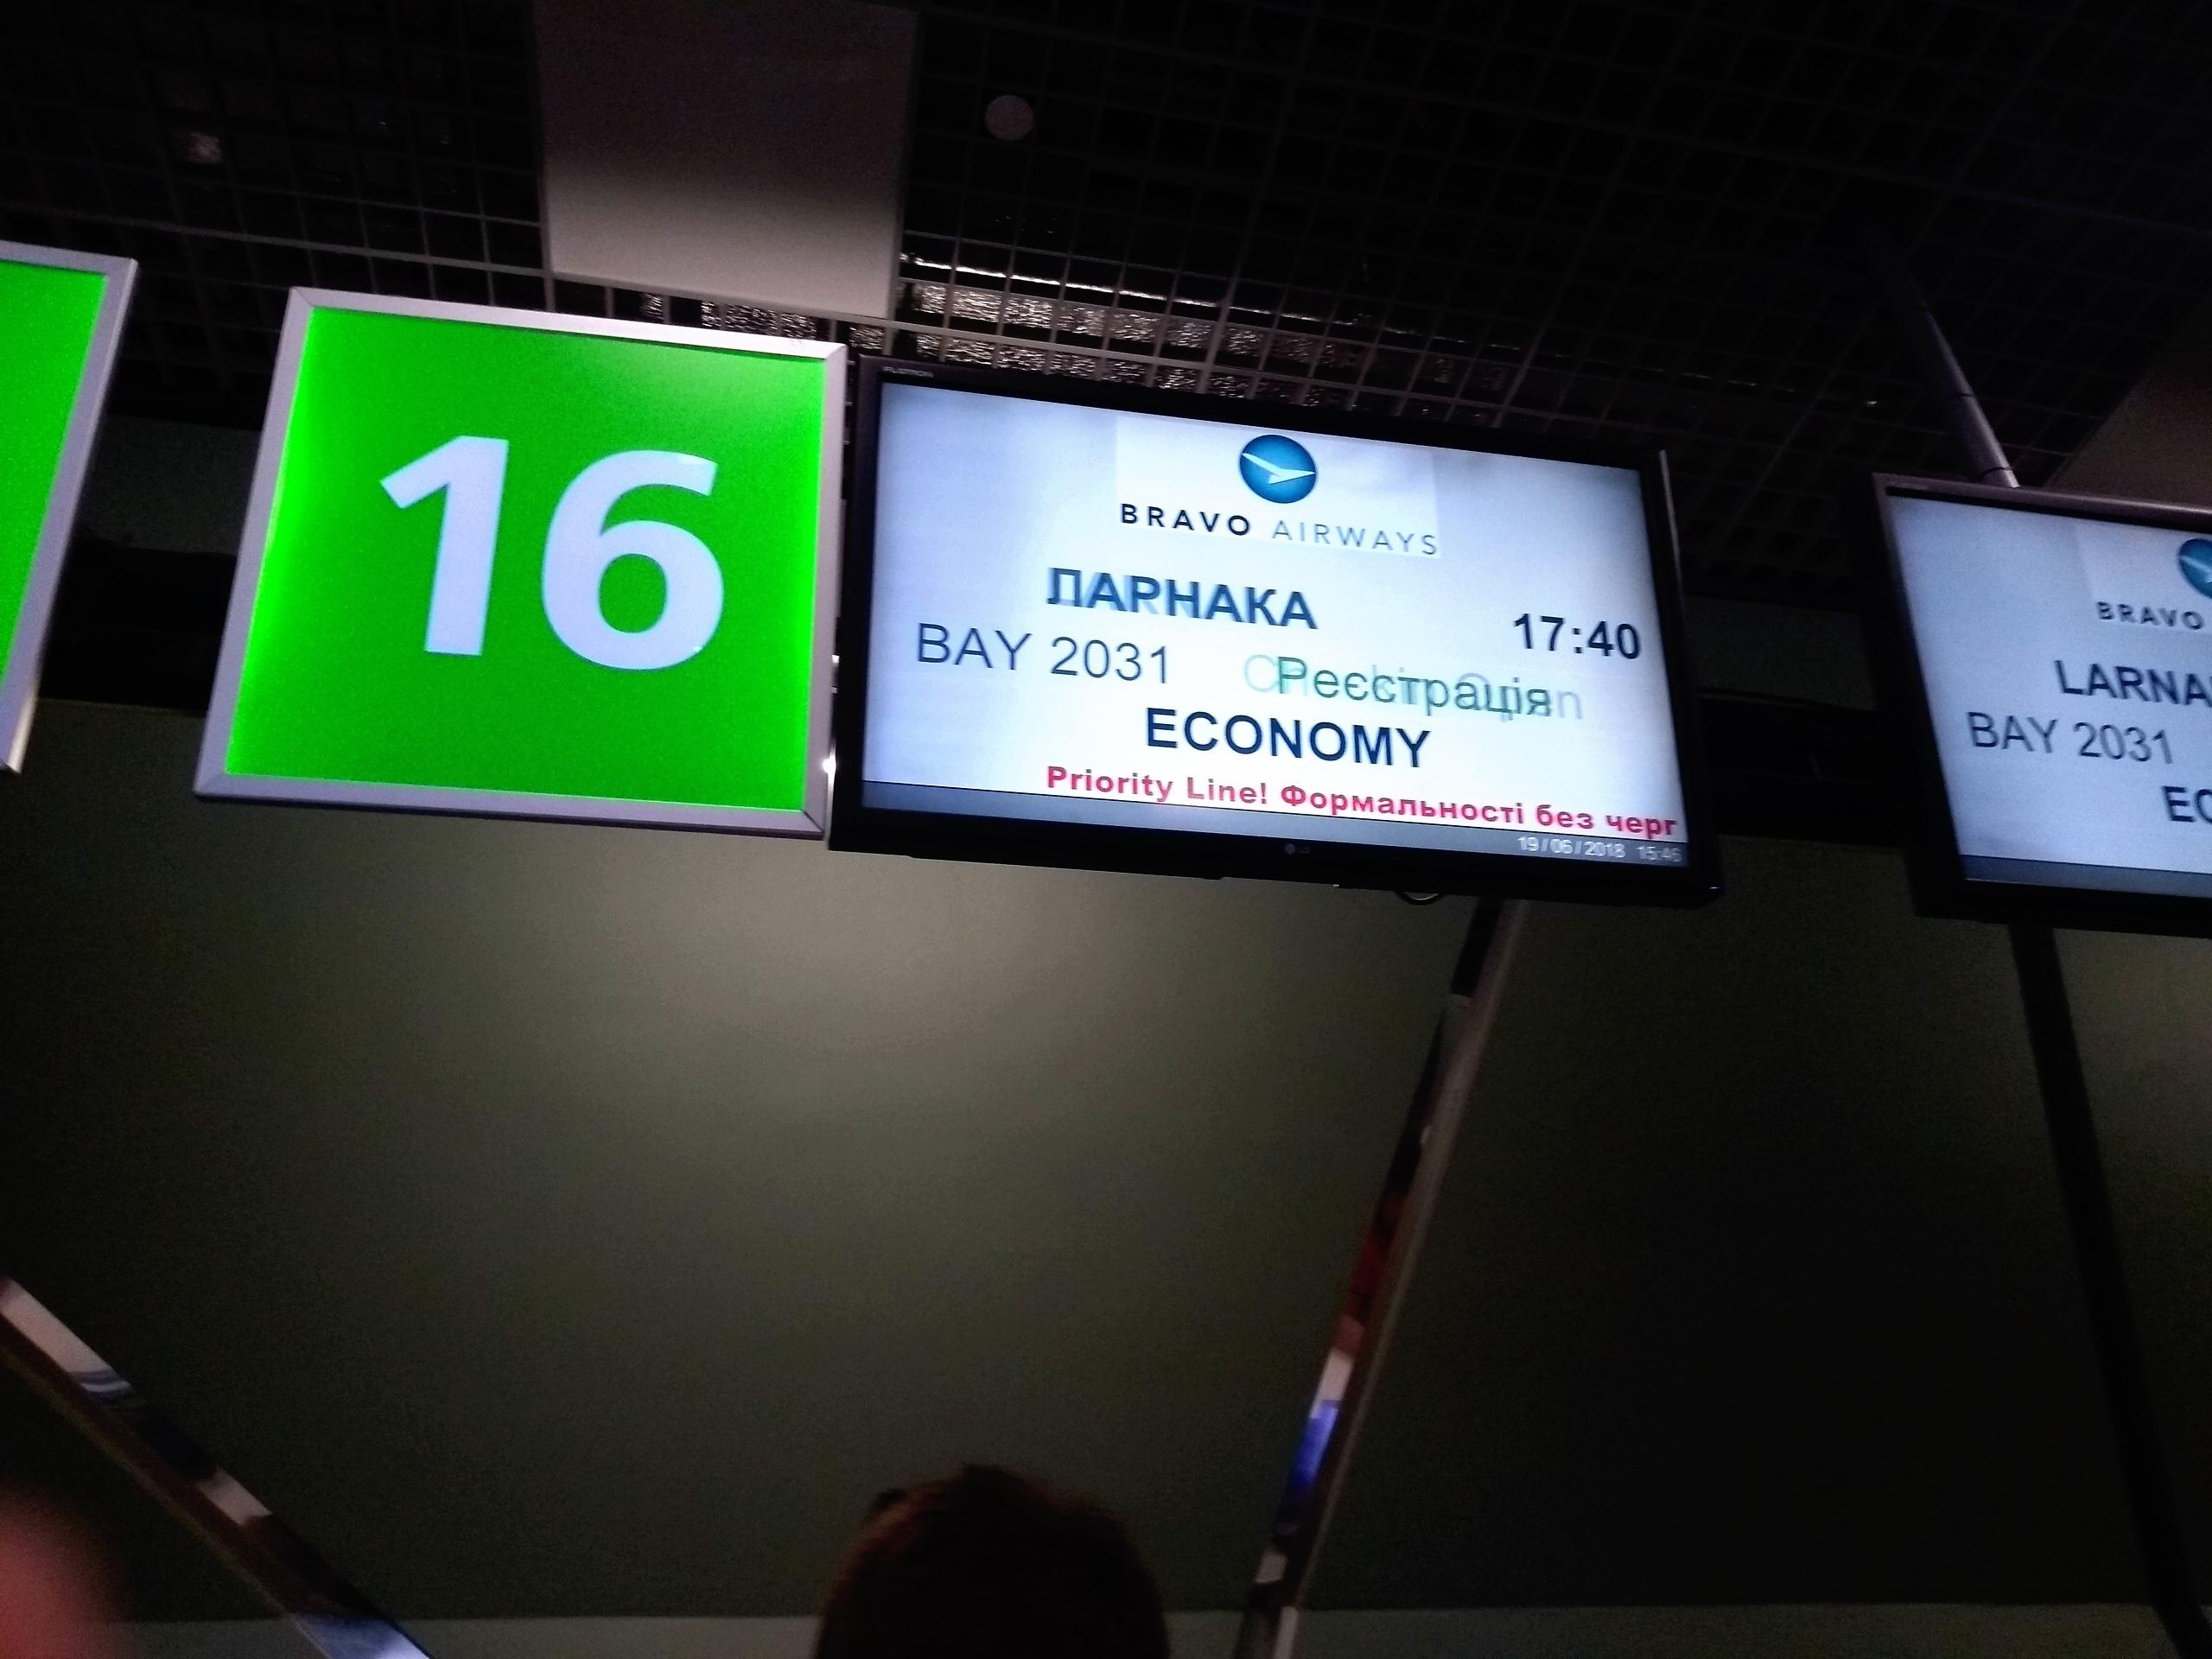 Елена Руденко (Валтея). Украина. Киев. Фото и описание.  HCmnvOluE50